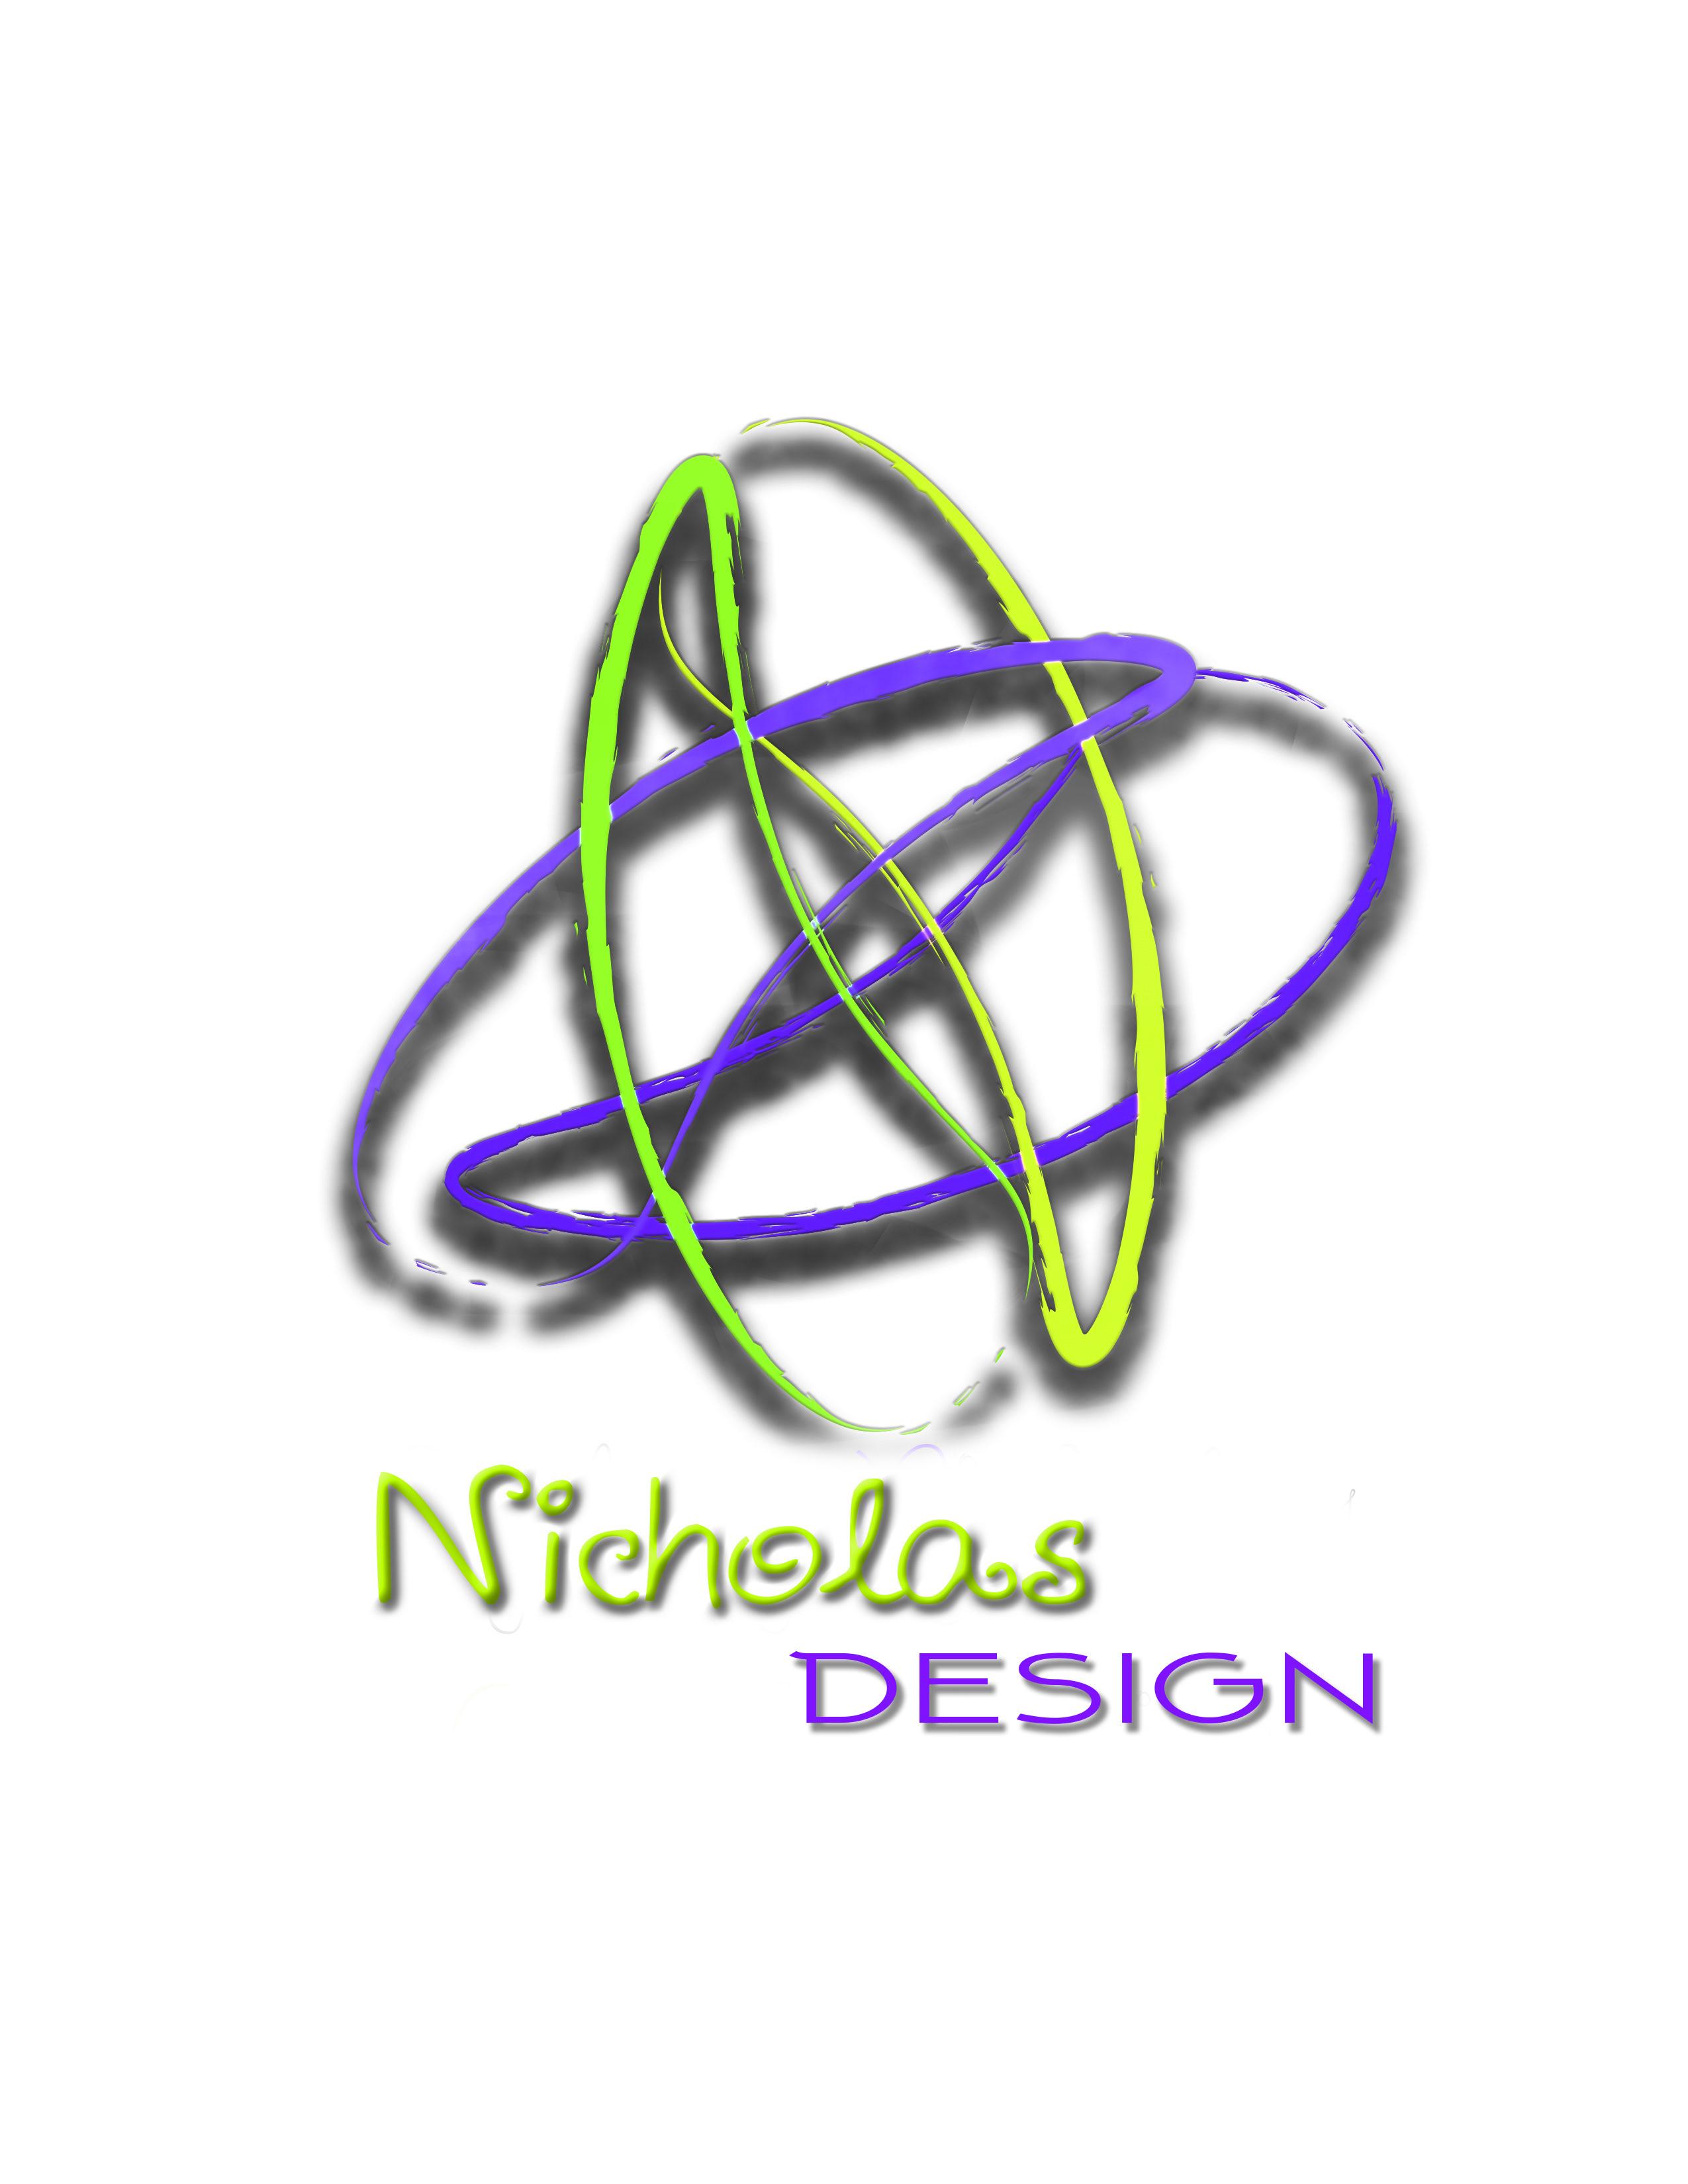 Sydney Nicholas